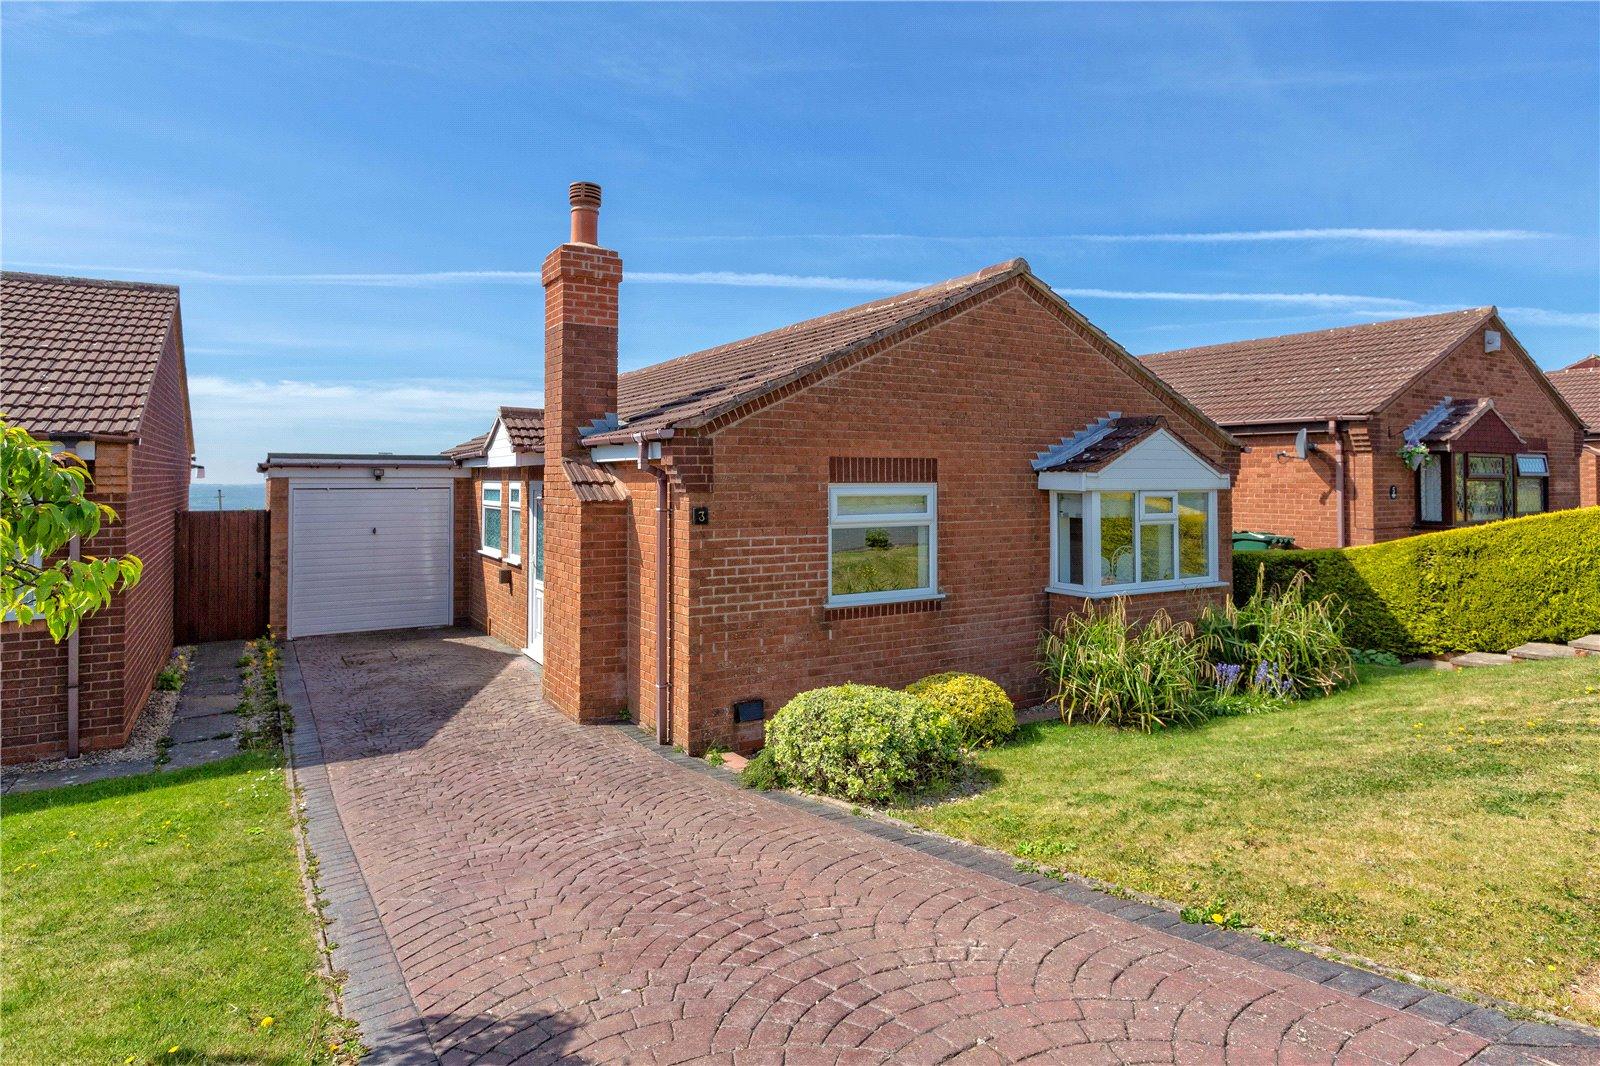 3 Dhustone Close, Clee Hill, Ludlow, Shropshire, SY8